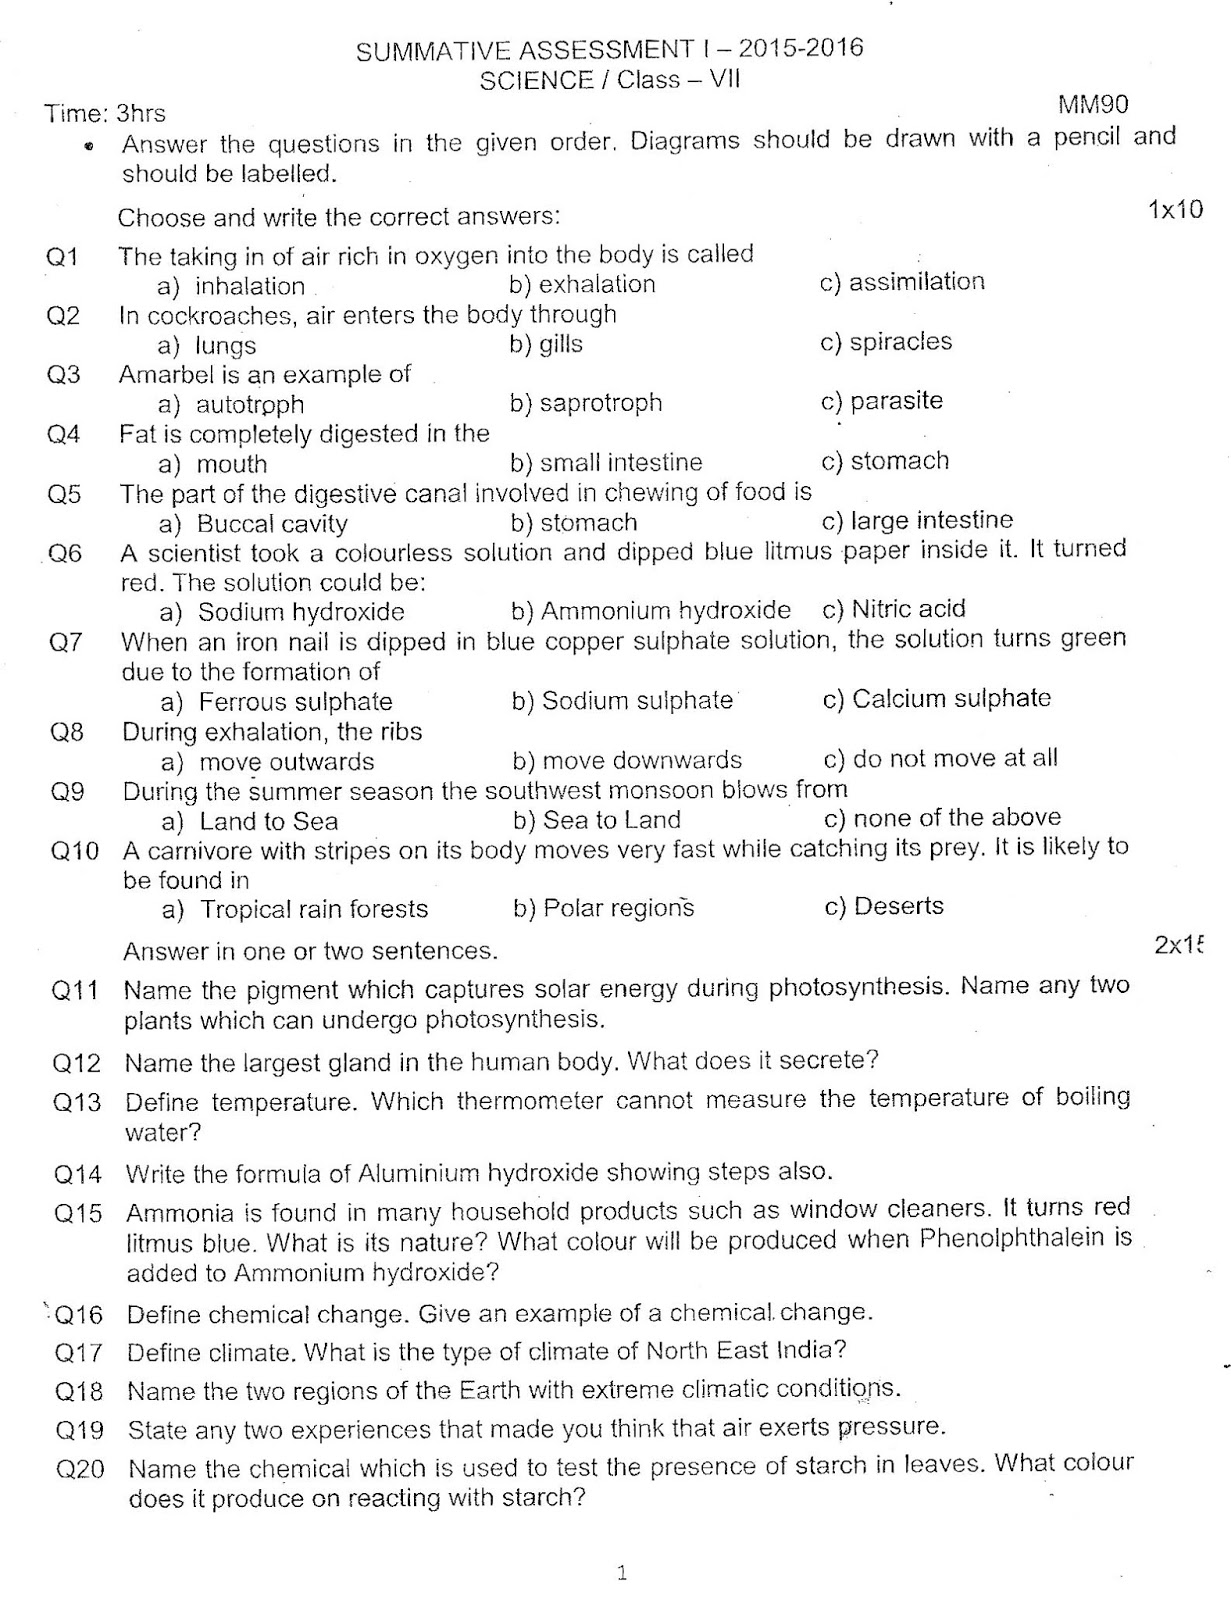 th Physics      First Mid Term Question Paper   TamilNadu